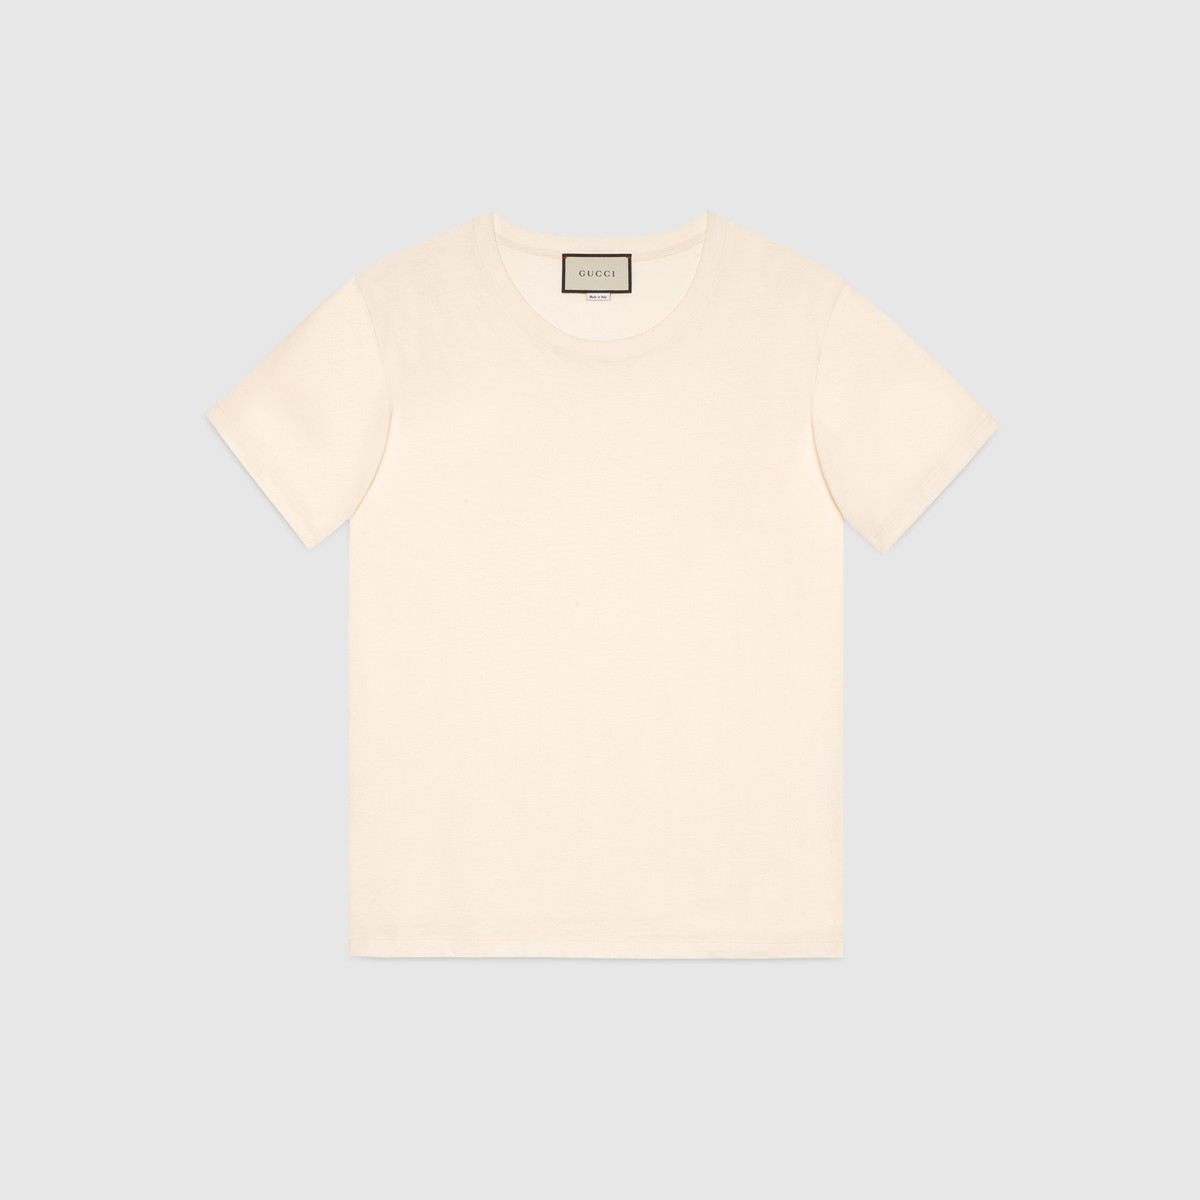 Gucci stamp print t shirt fashion frenesie for Stamp t shirt printing